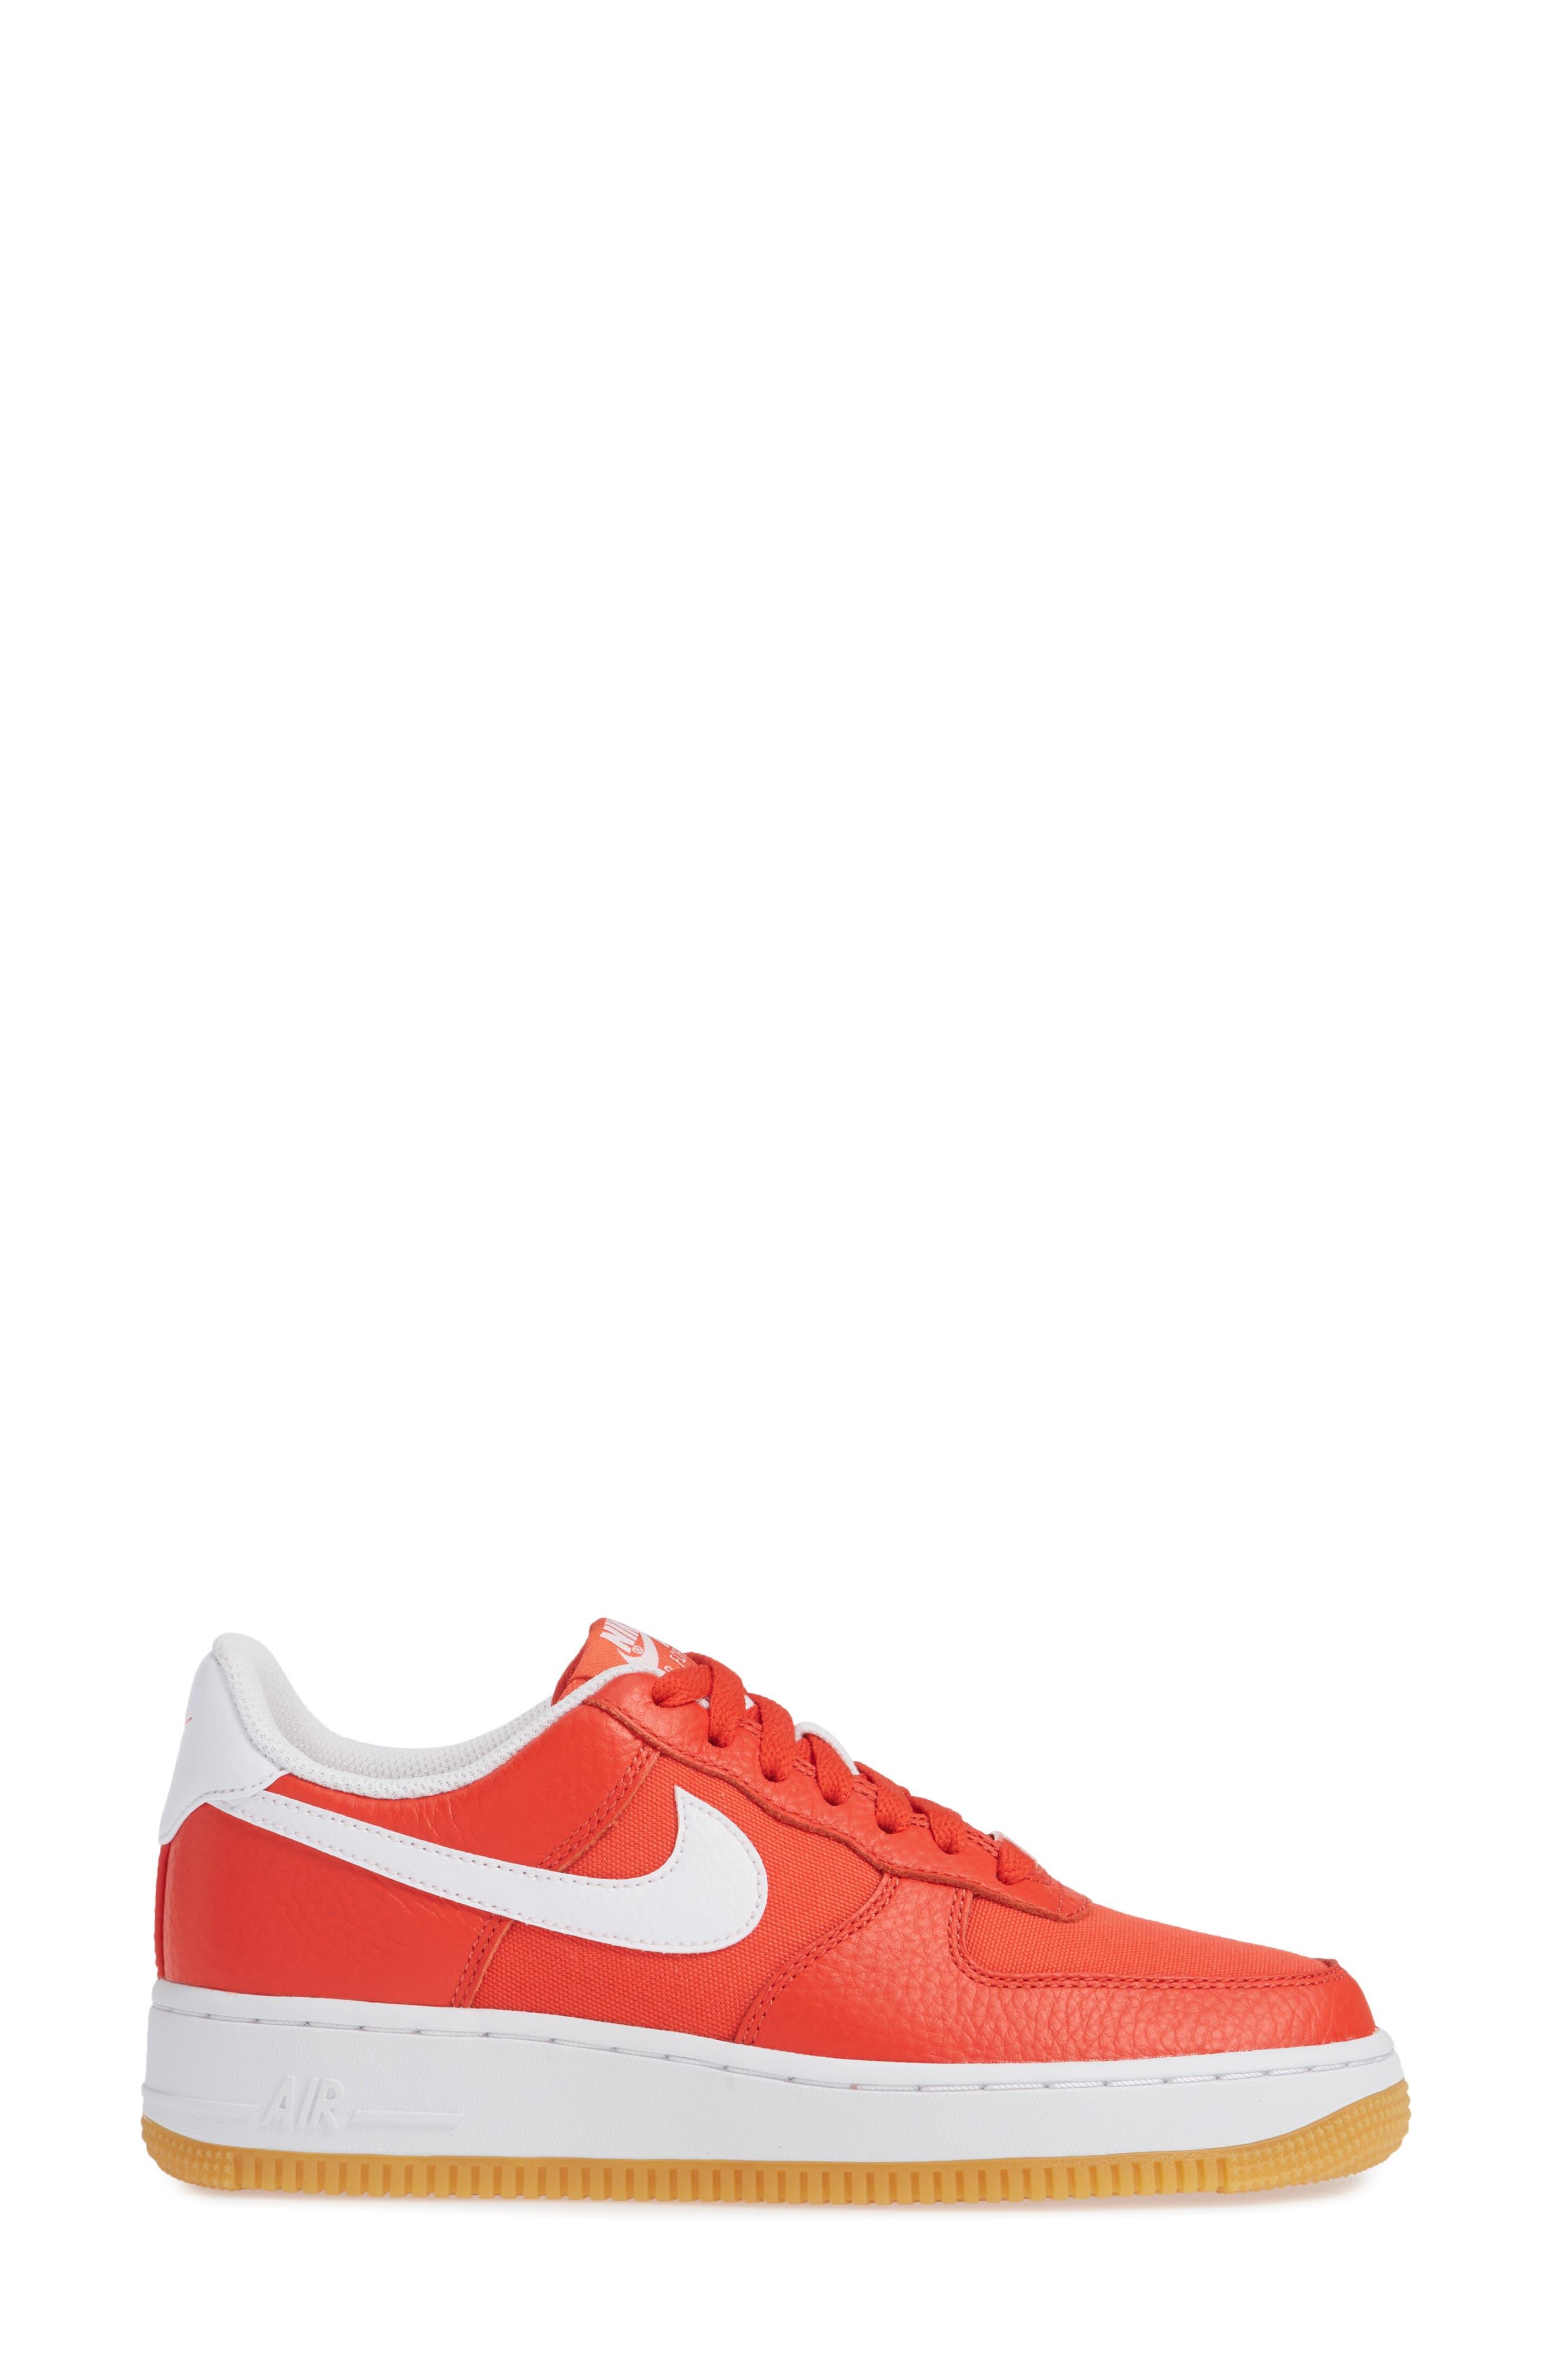 Air Force 1 '07 Premium Sneaker,                             Alternate thumbnail 3, color,                             Red/ White/ Light Brown